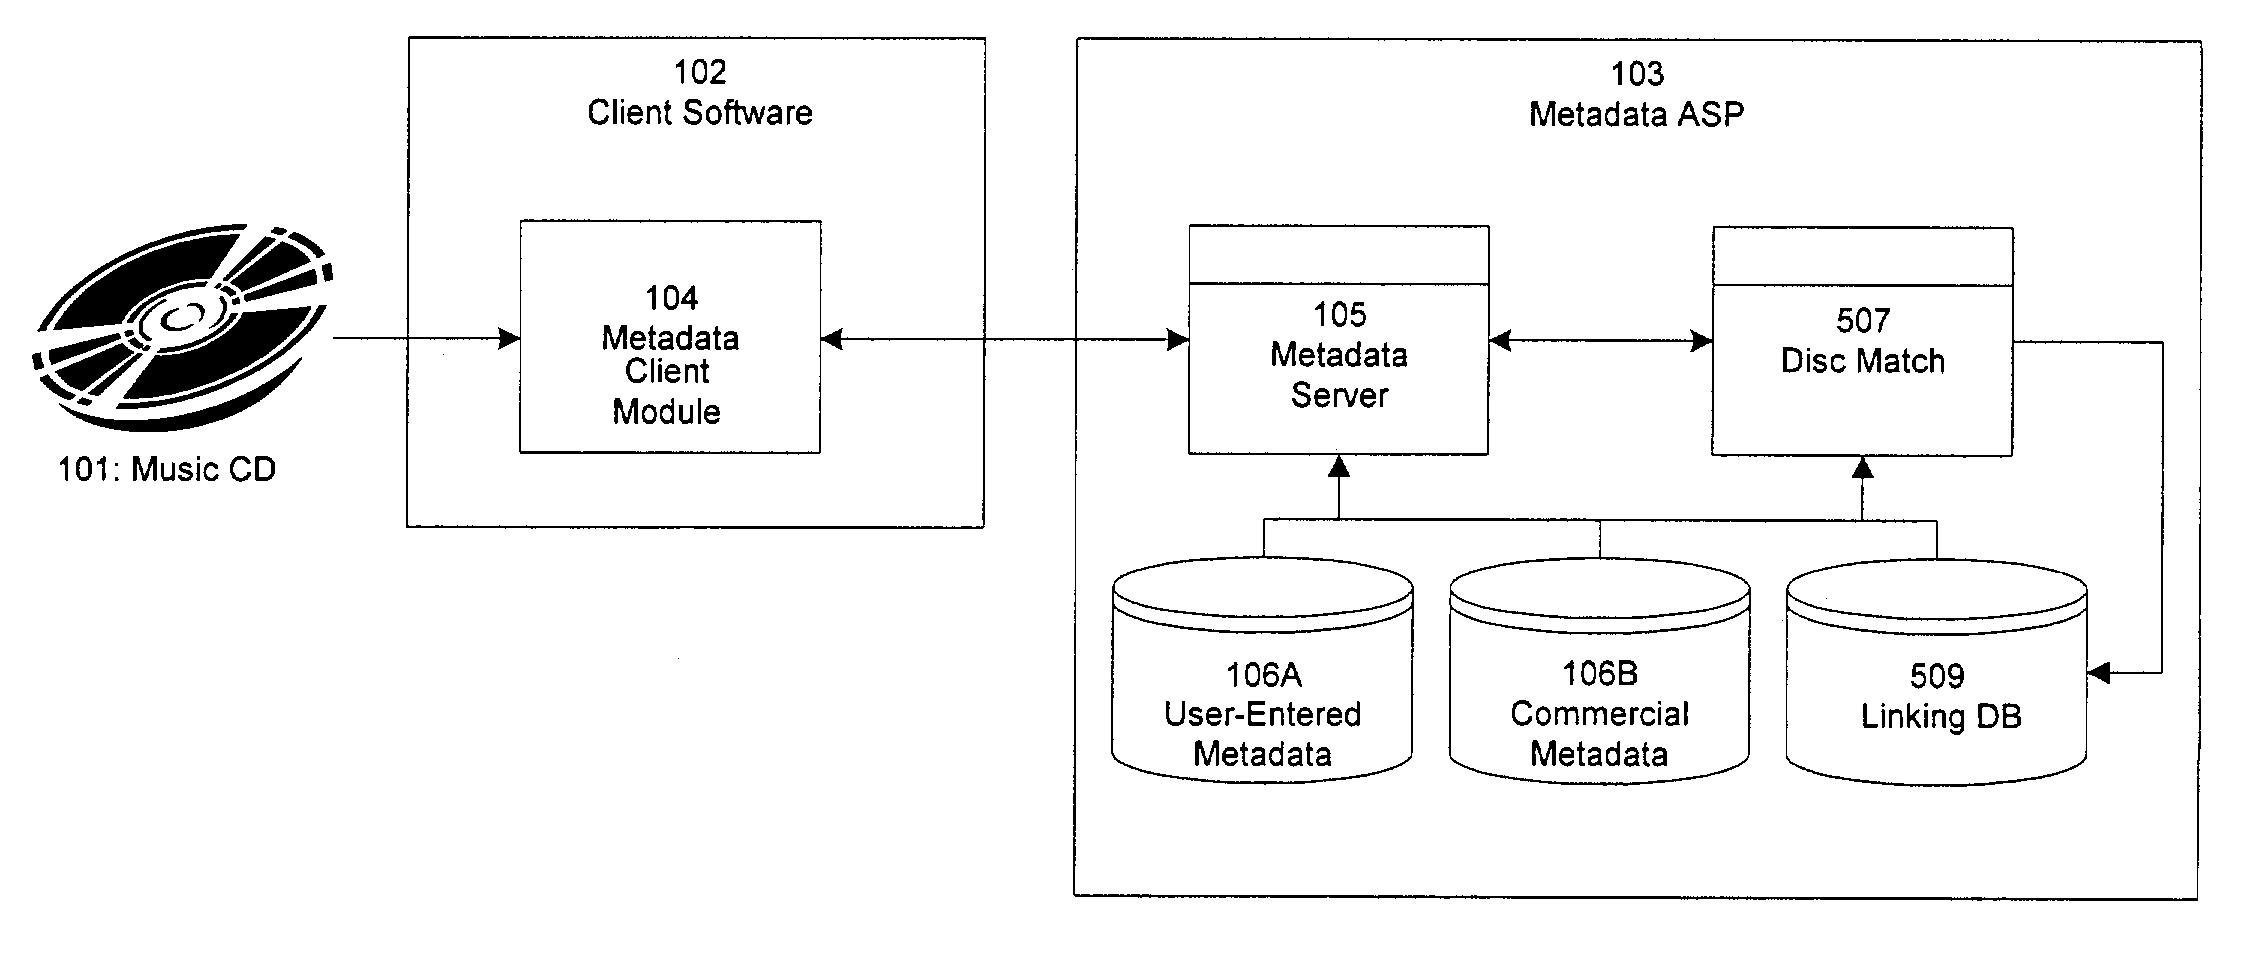 Patent US 7,707,221 B1